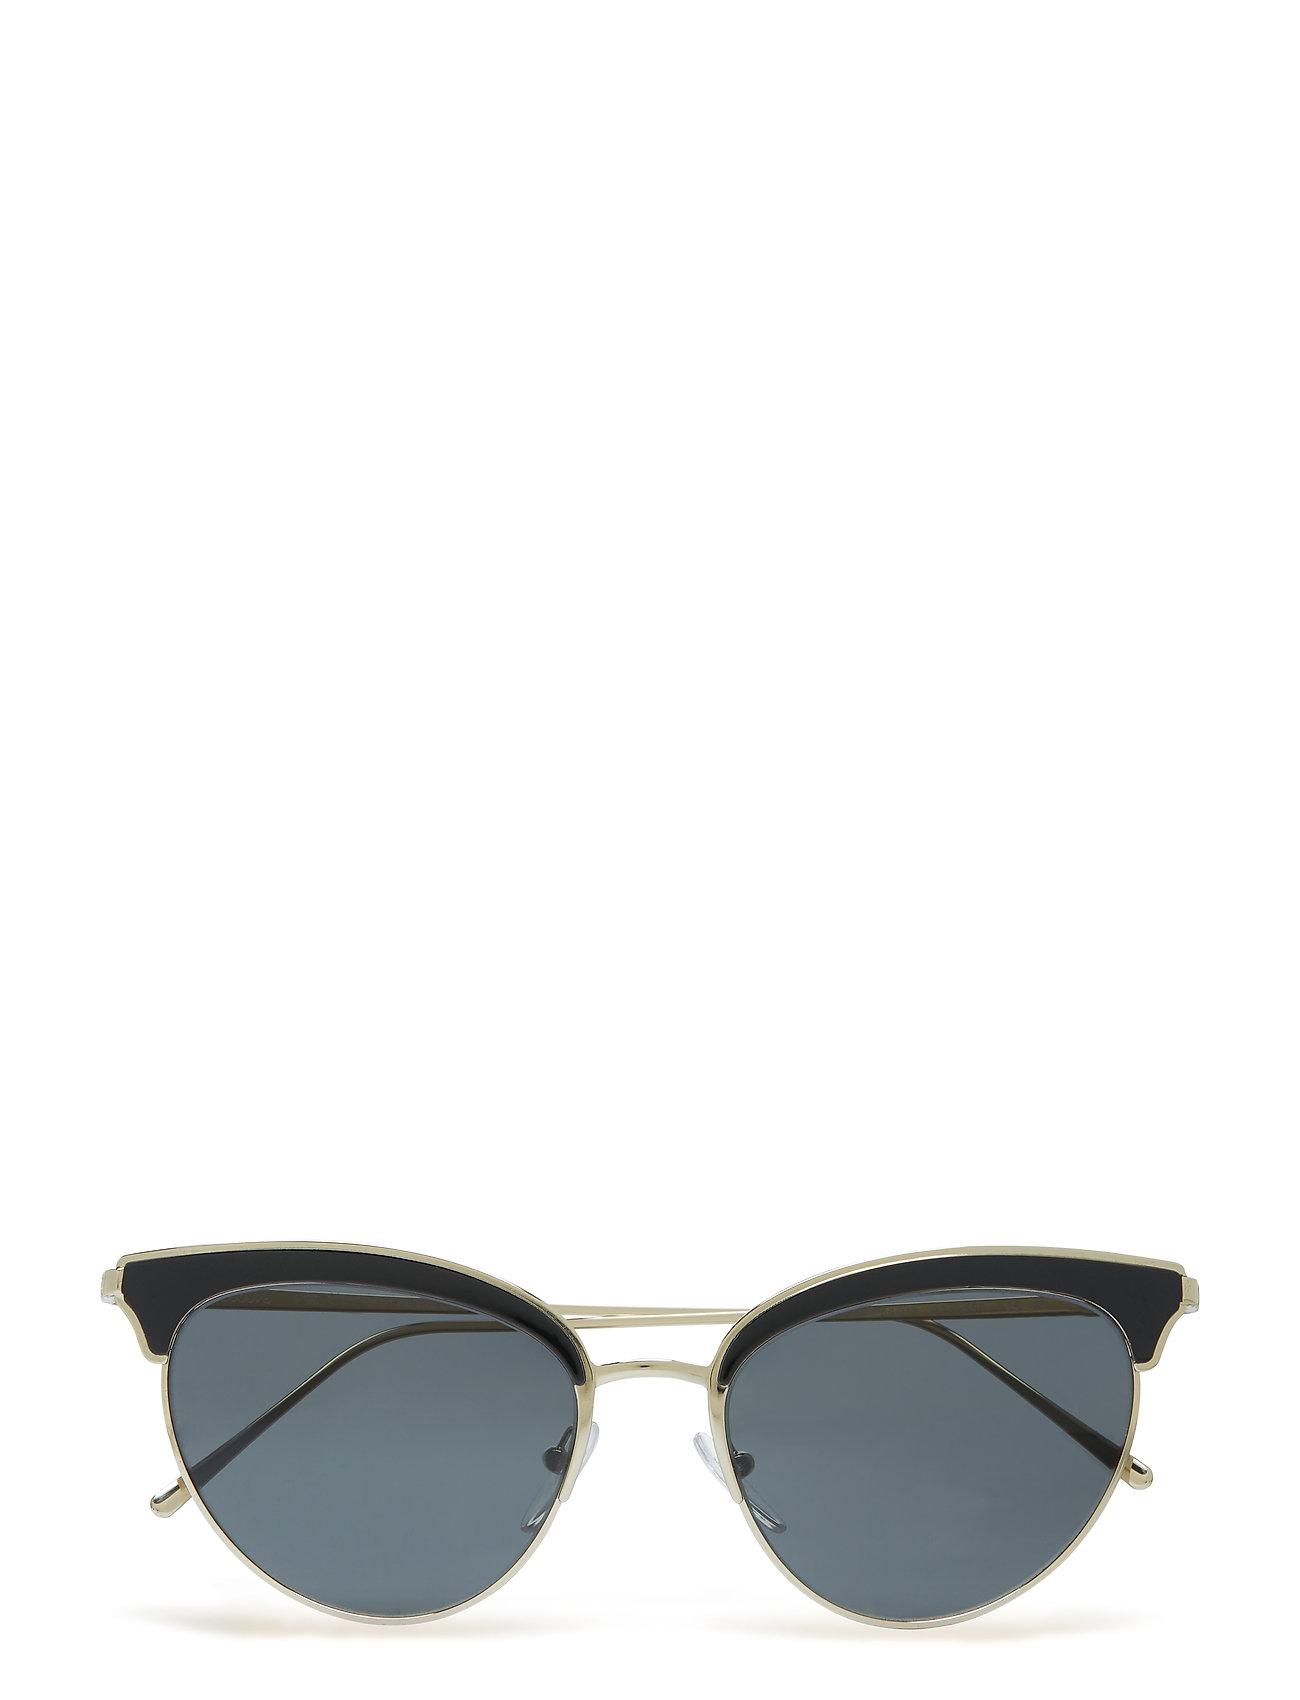 Image of Prada Sunglasses 0pr 60vs Aurinkolasit Sininen Prada Sunglasses